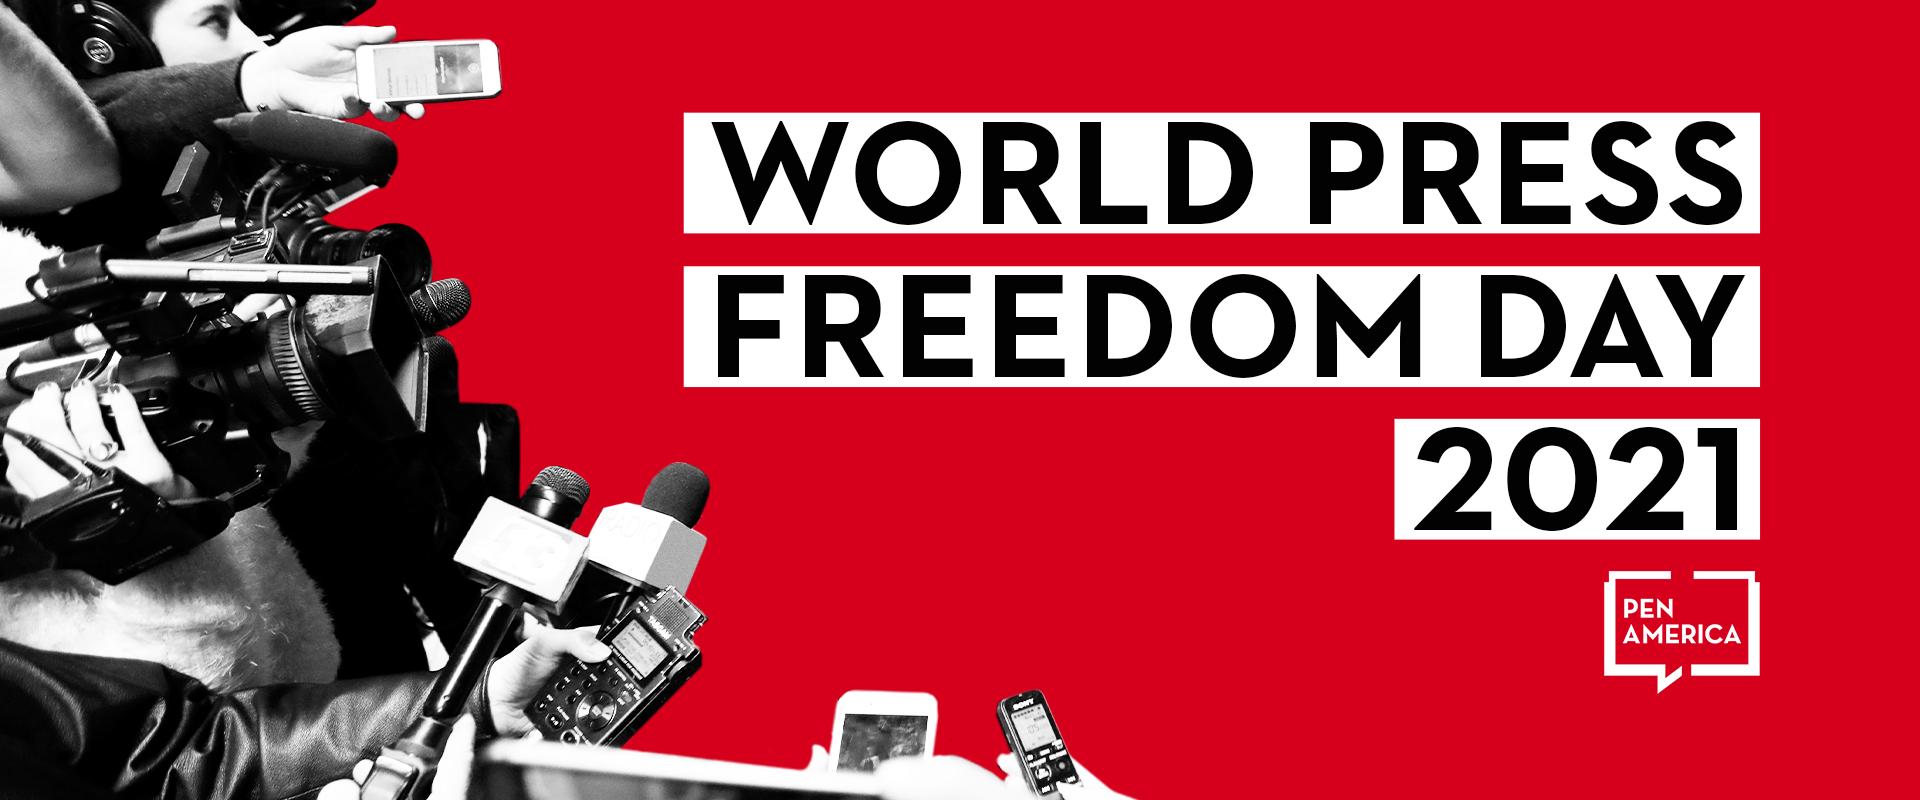 2021 World Press Freedom Day Hero Image